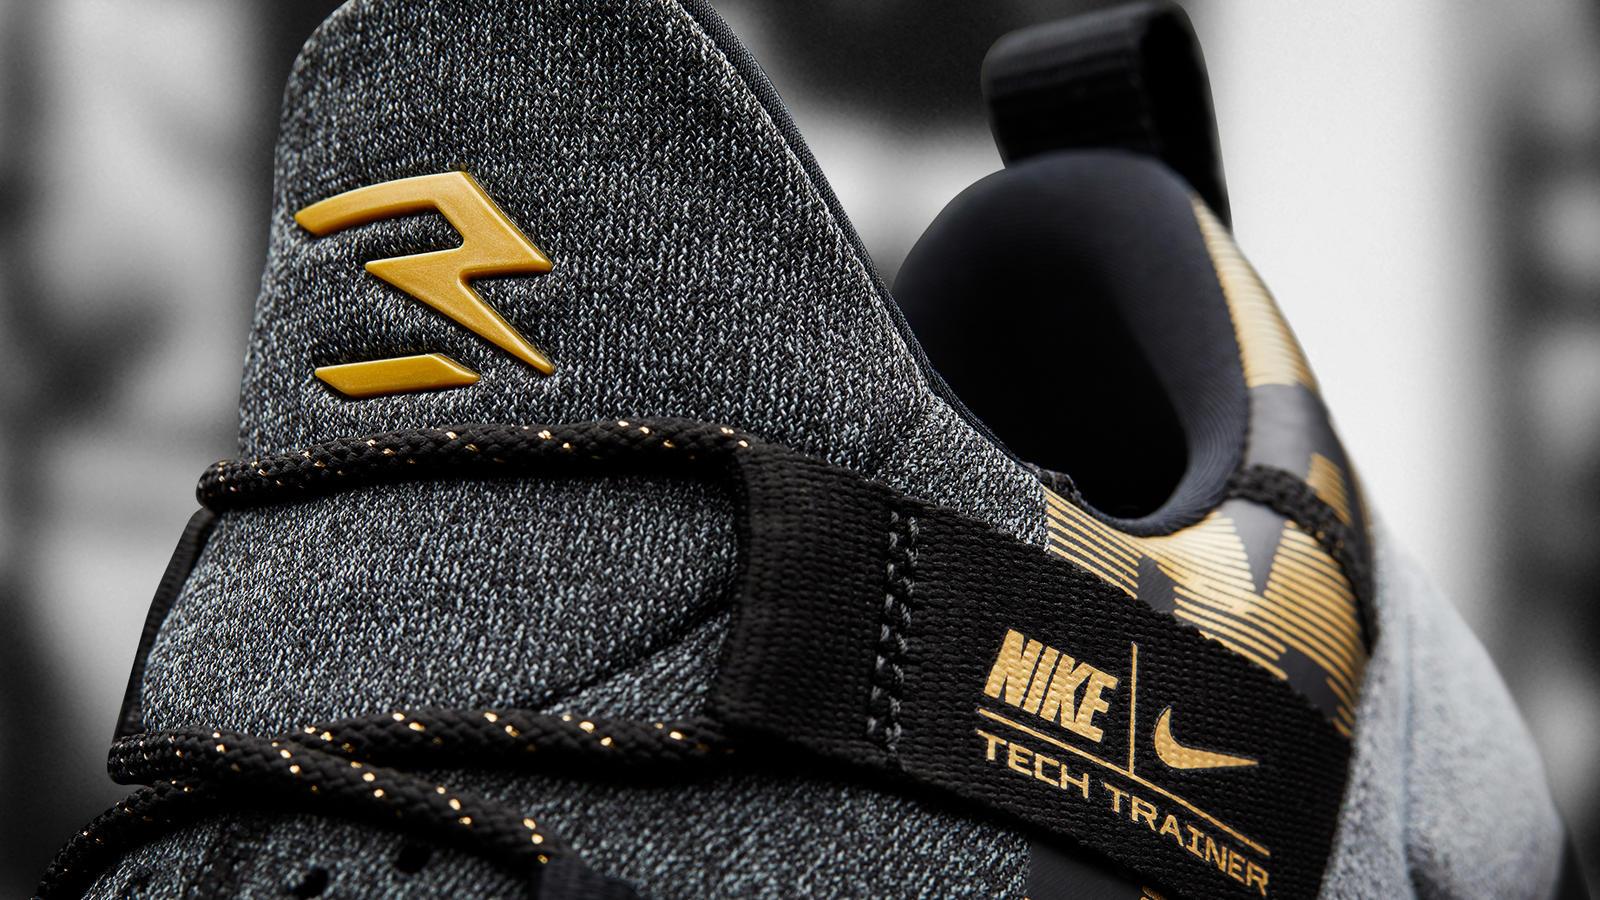 Russell Wilson Nike Tech Trainer - Nike